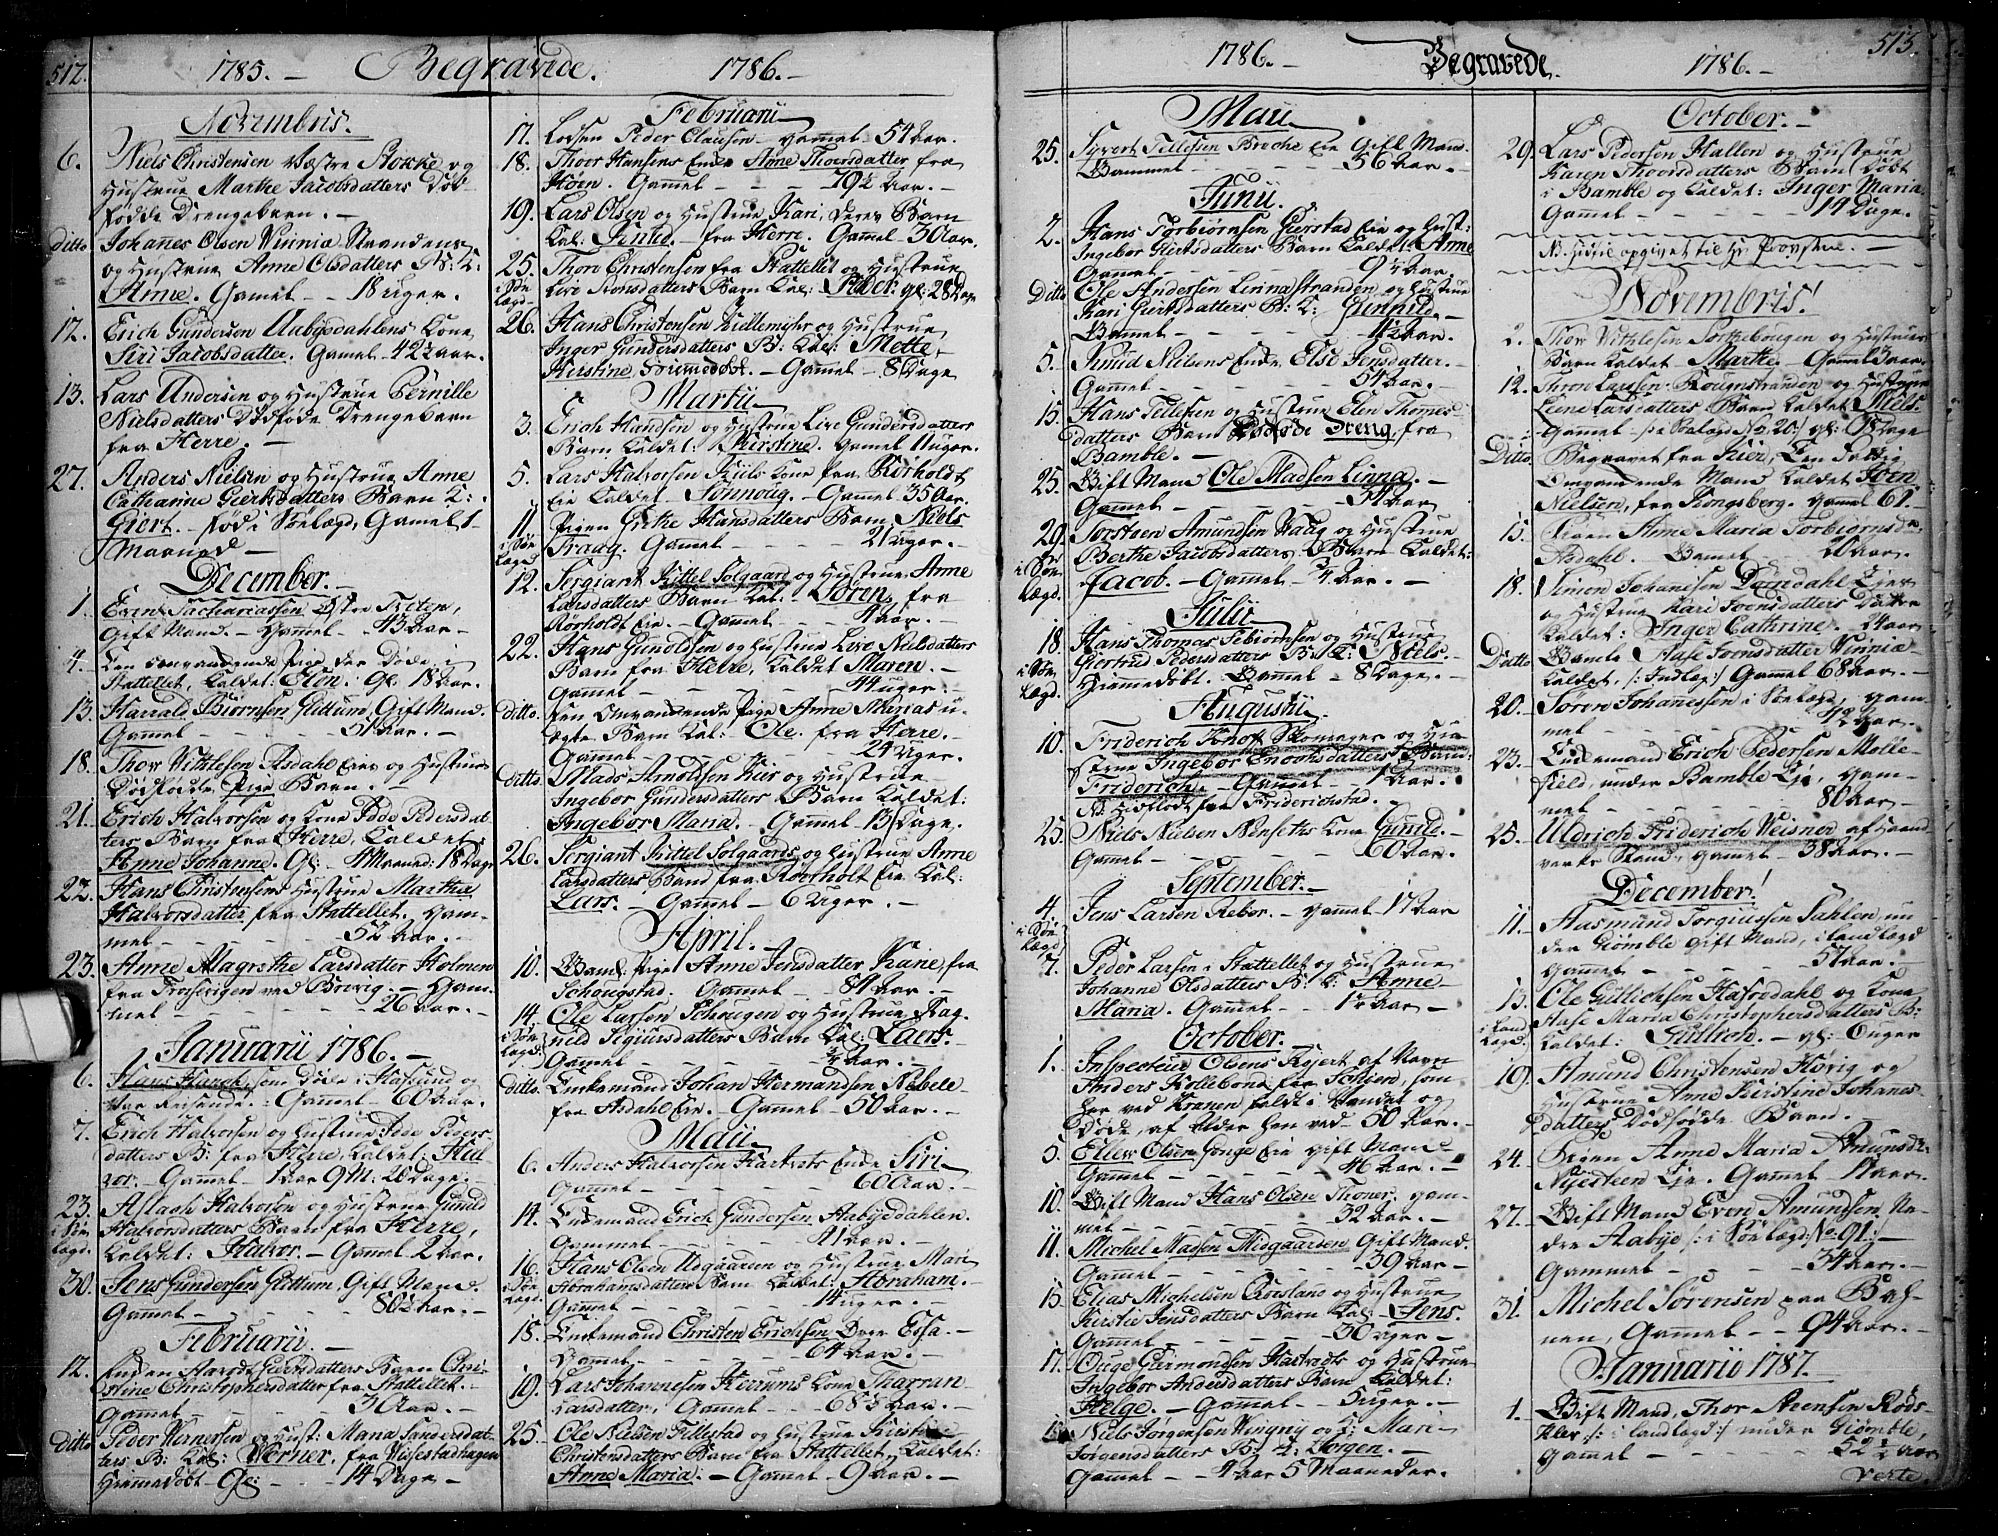 SAKO, Bamble kirkebøker, F/Fa/L0002: Ministerialbok nr. I 2, 1775-1814, s. 512-513